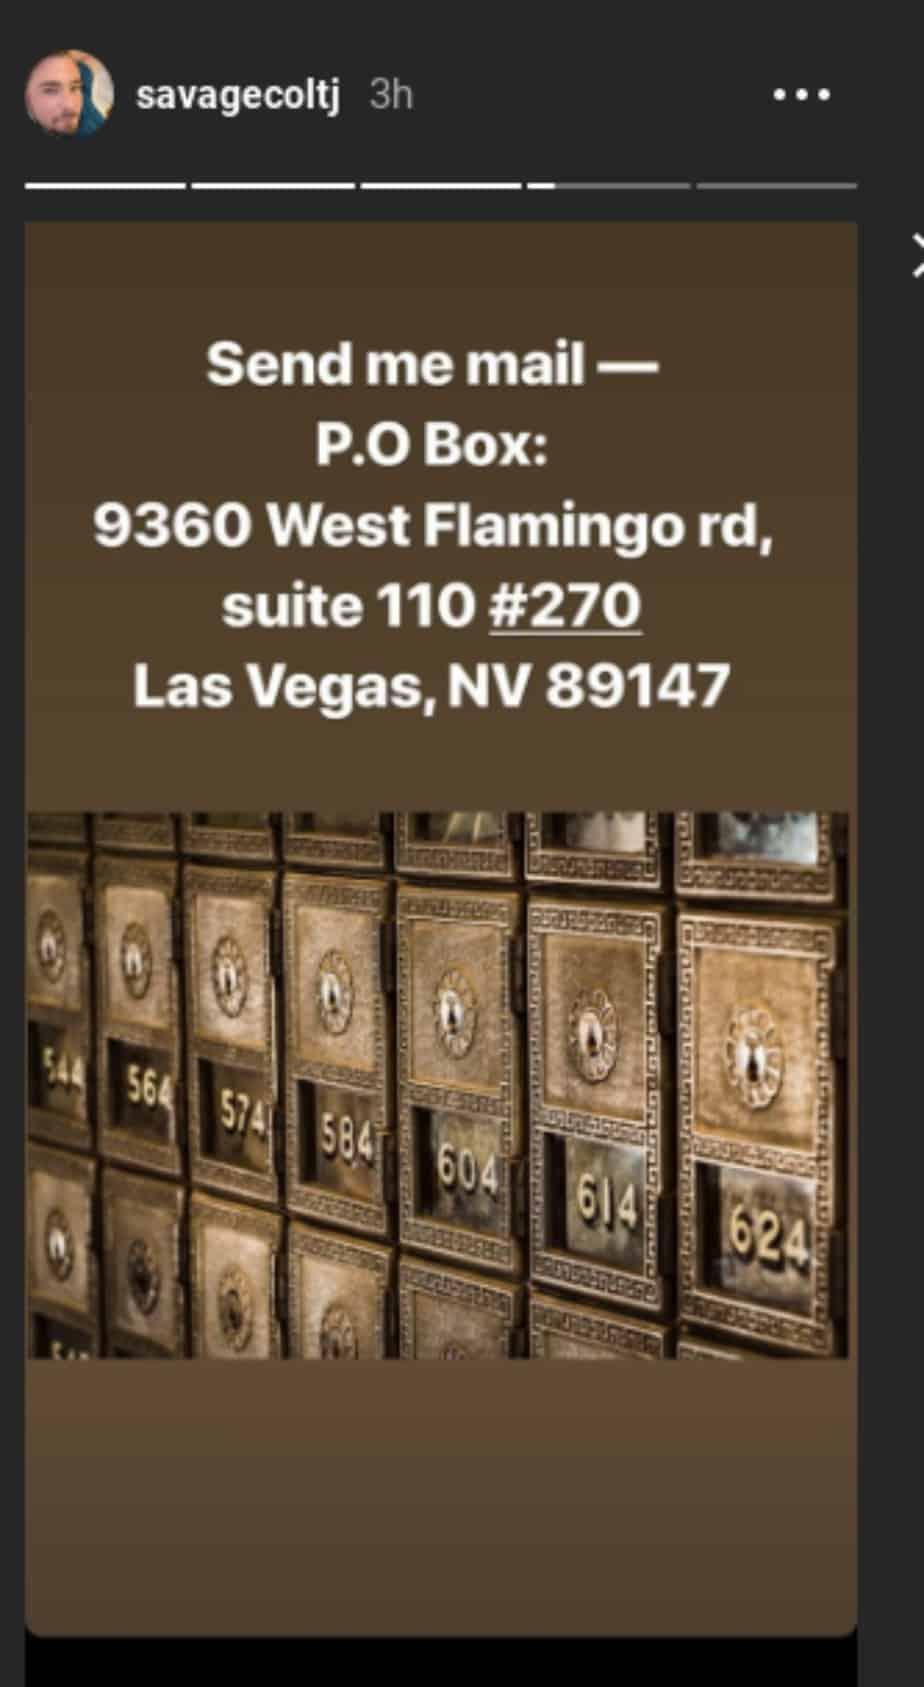 Colt Johnson's address